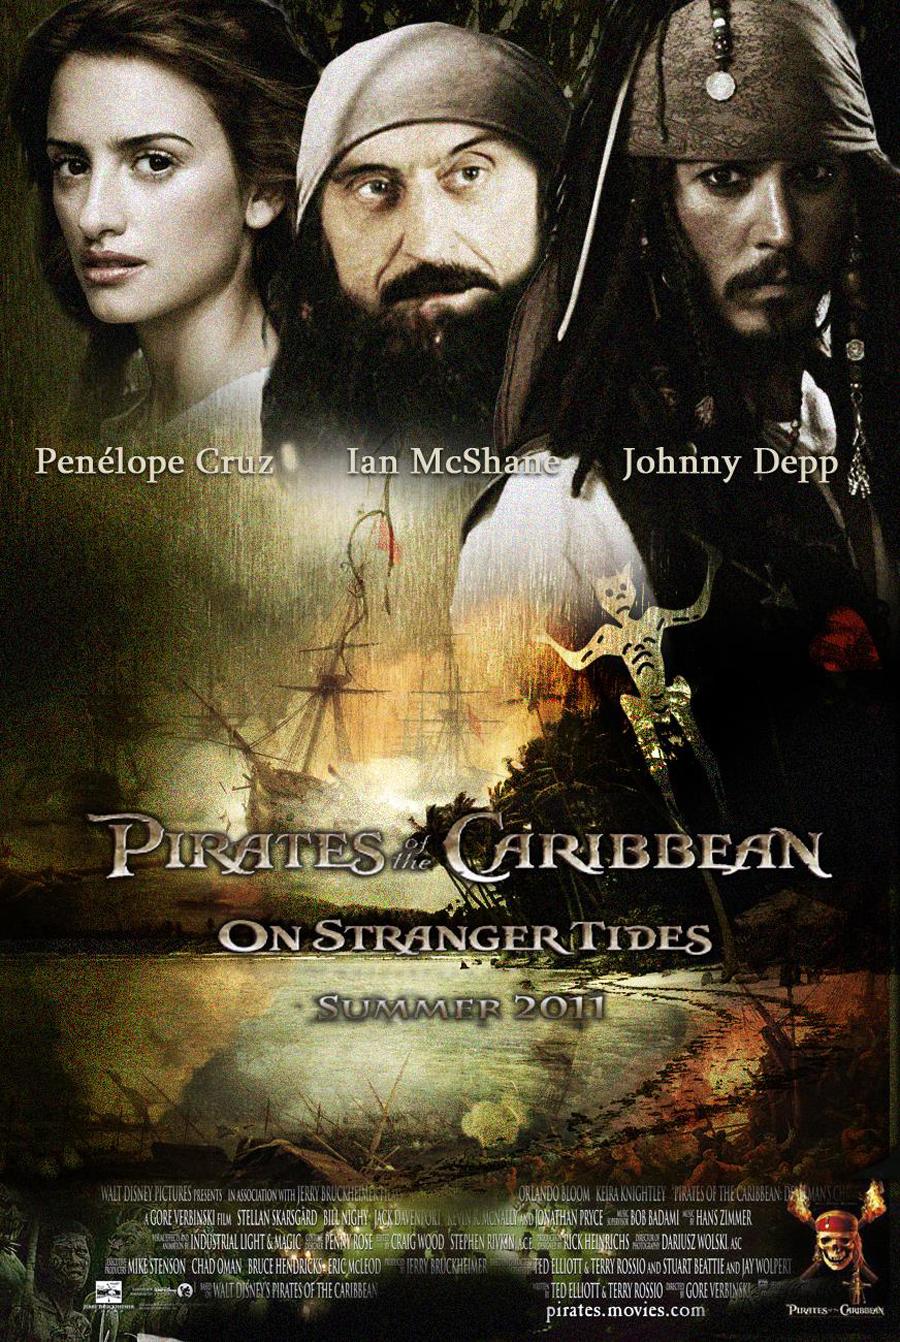 Pirati Dei Caraibi 1 Poster Pirati Dei Caraibi